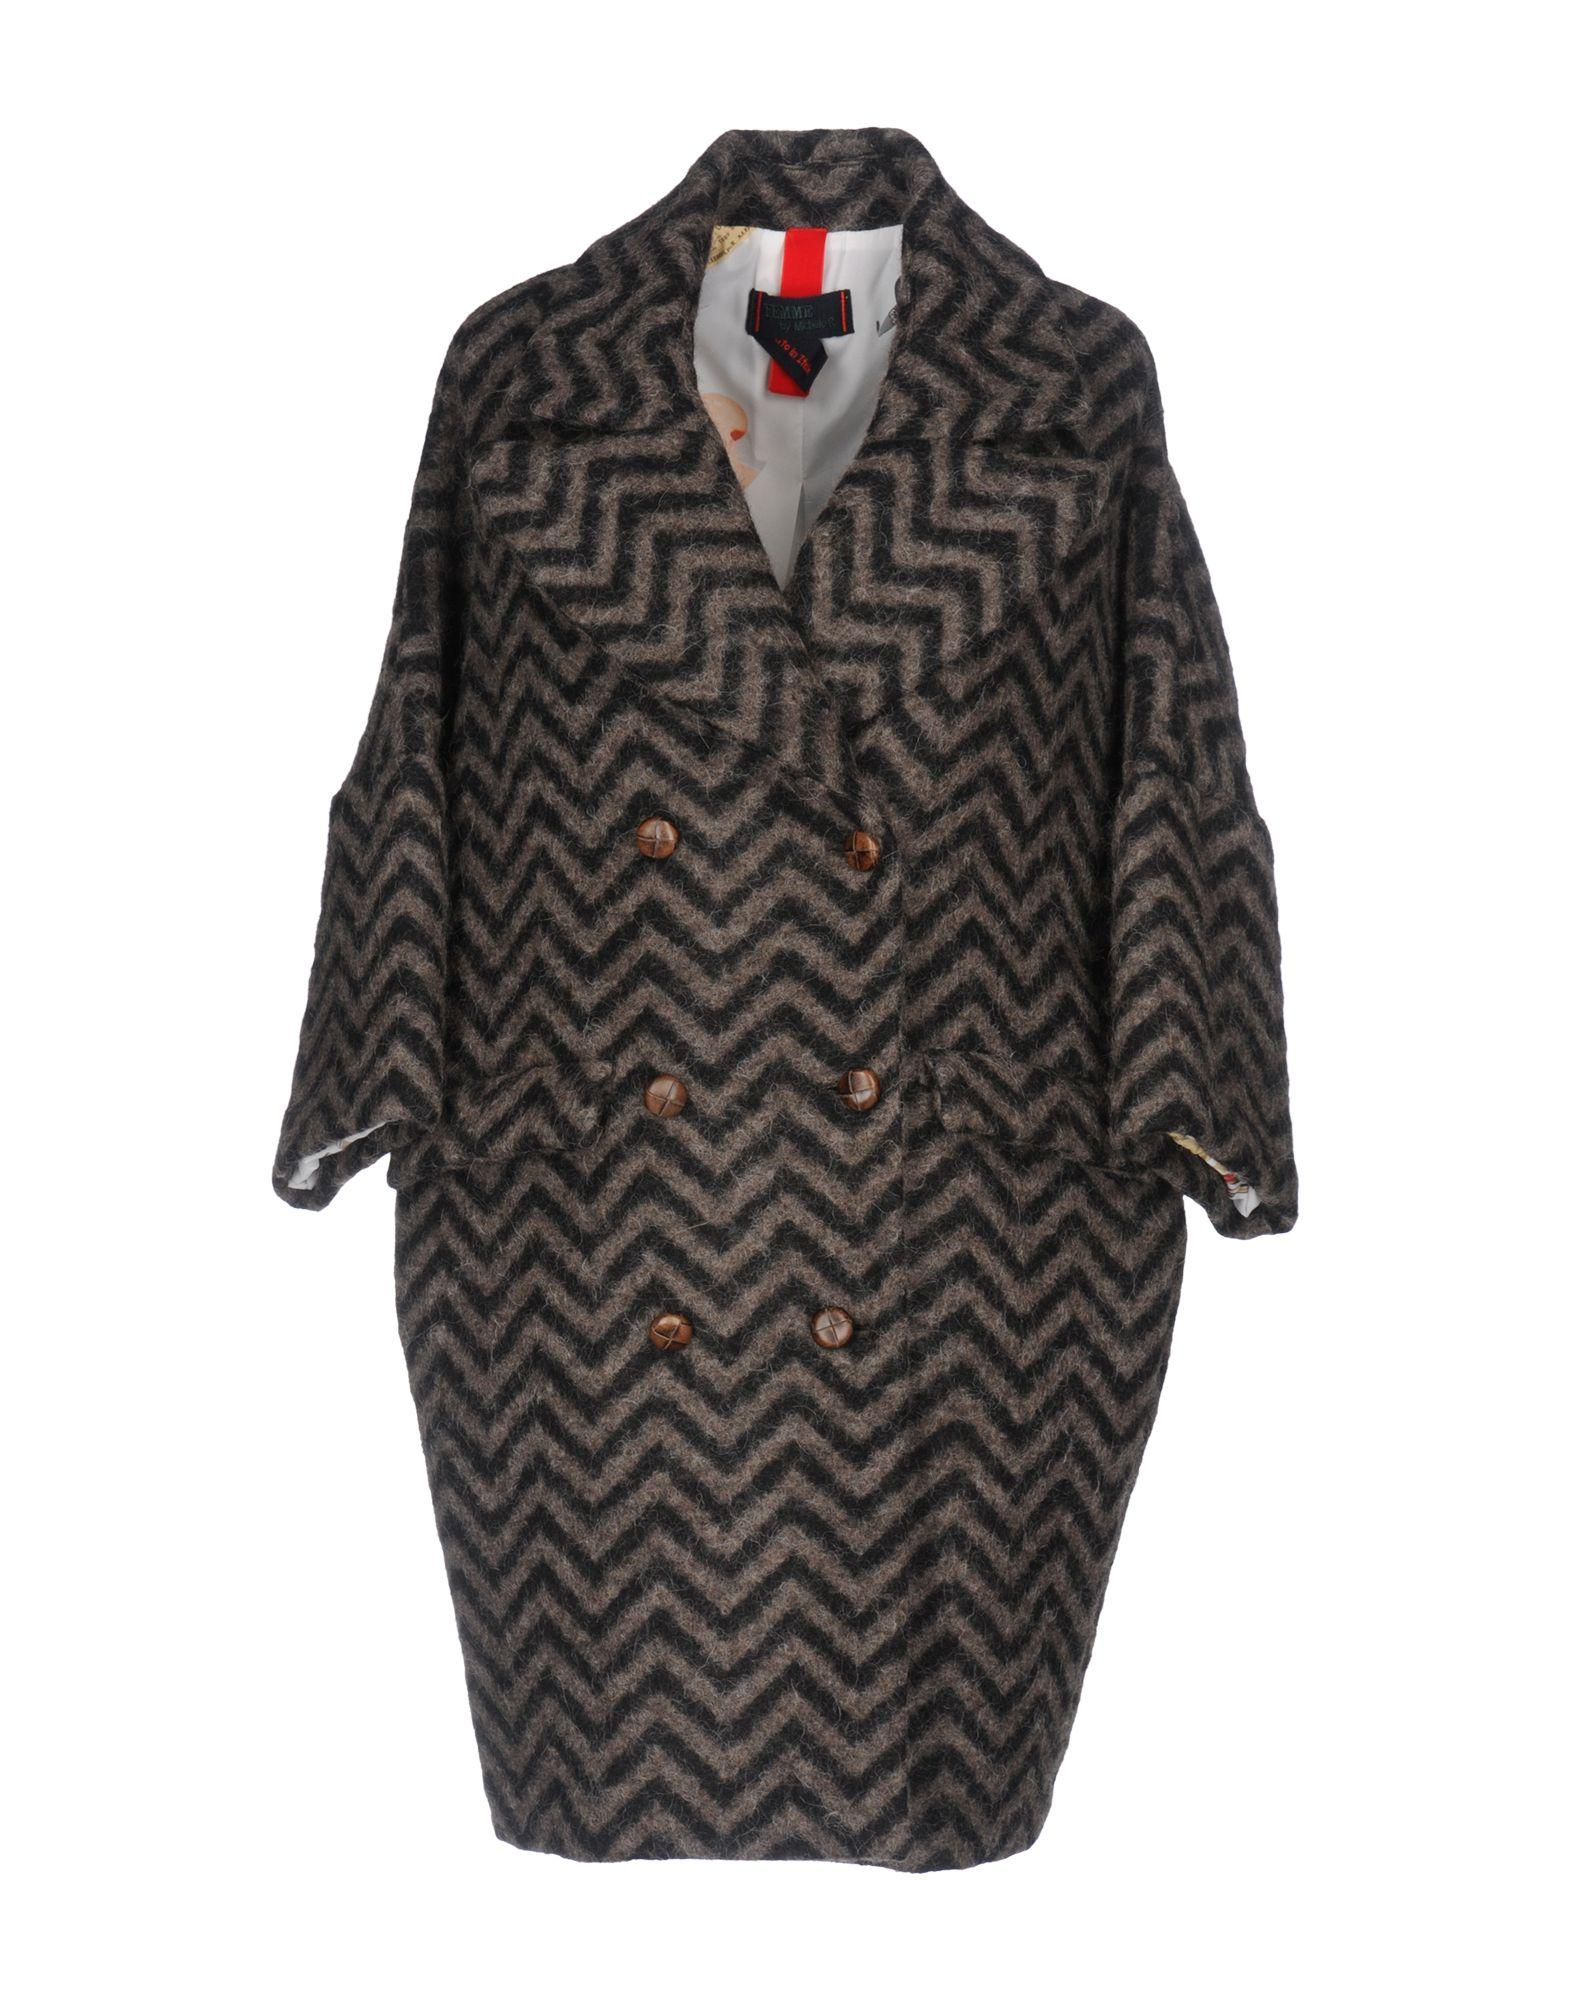 Femme By Michele Rossi Coats In Khaki